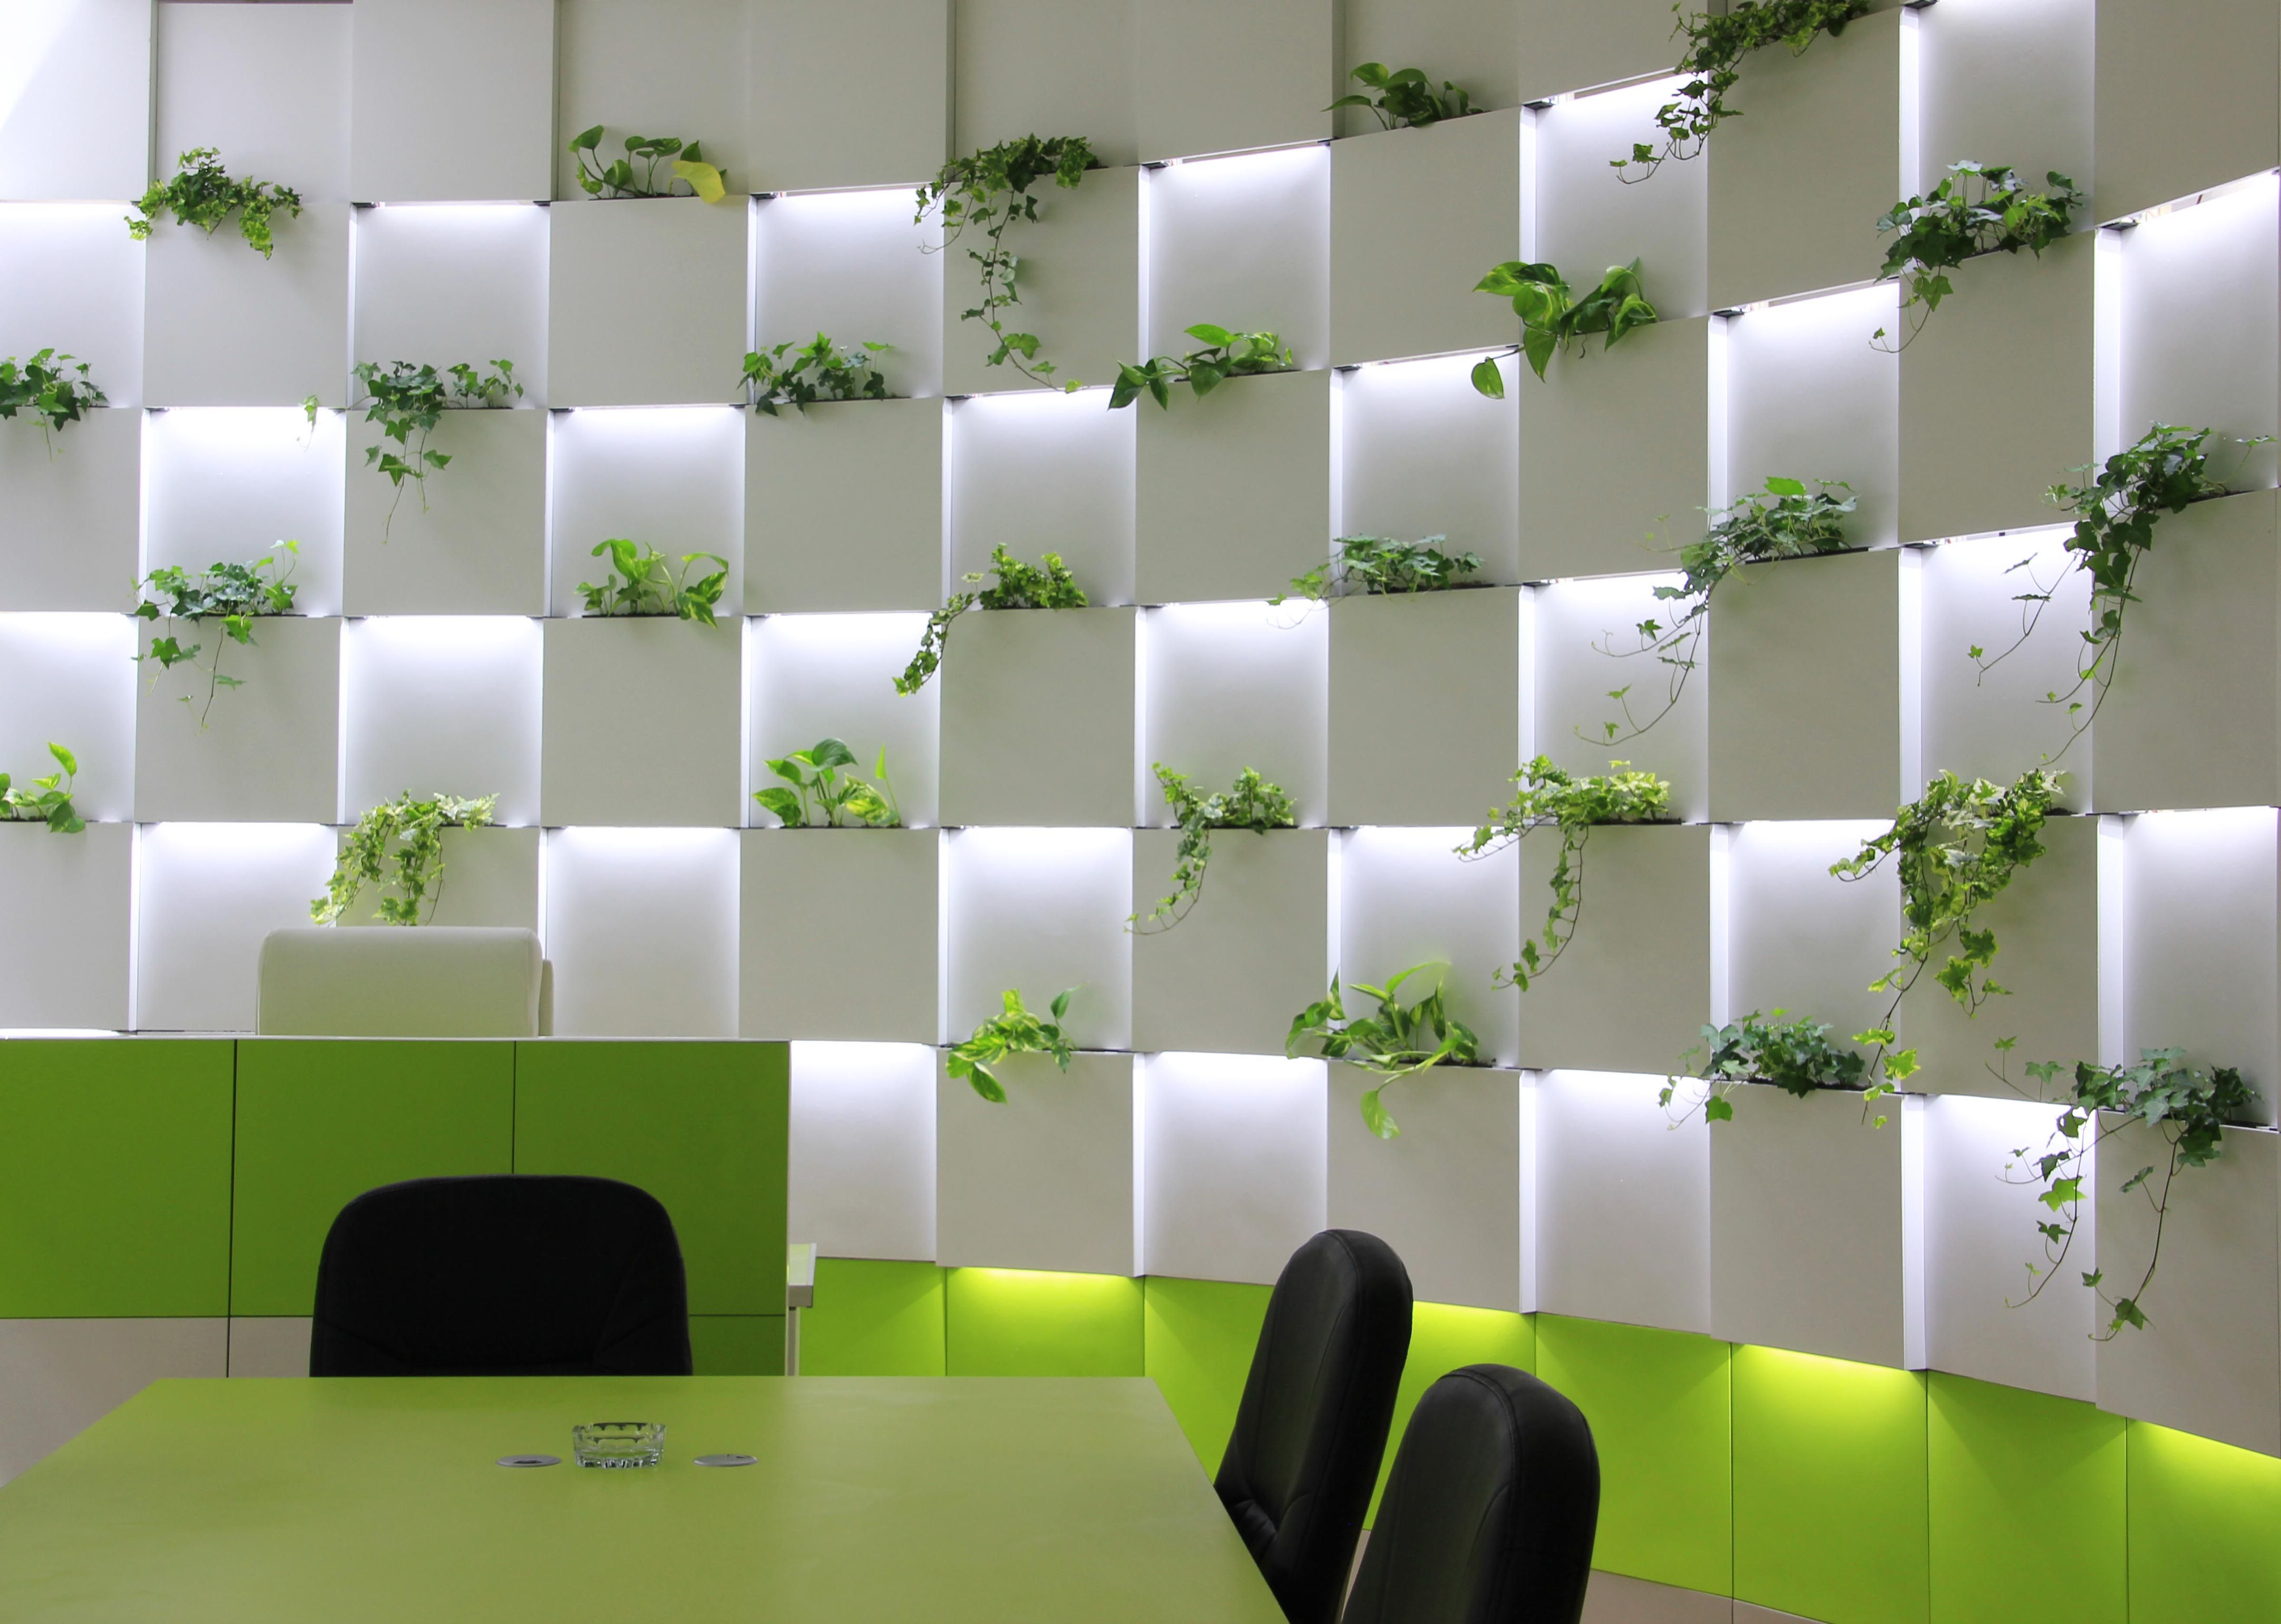 Oficina moderno contract via planreforma sillas for Jardin vertical oficina